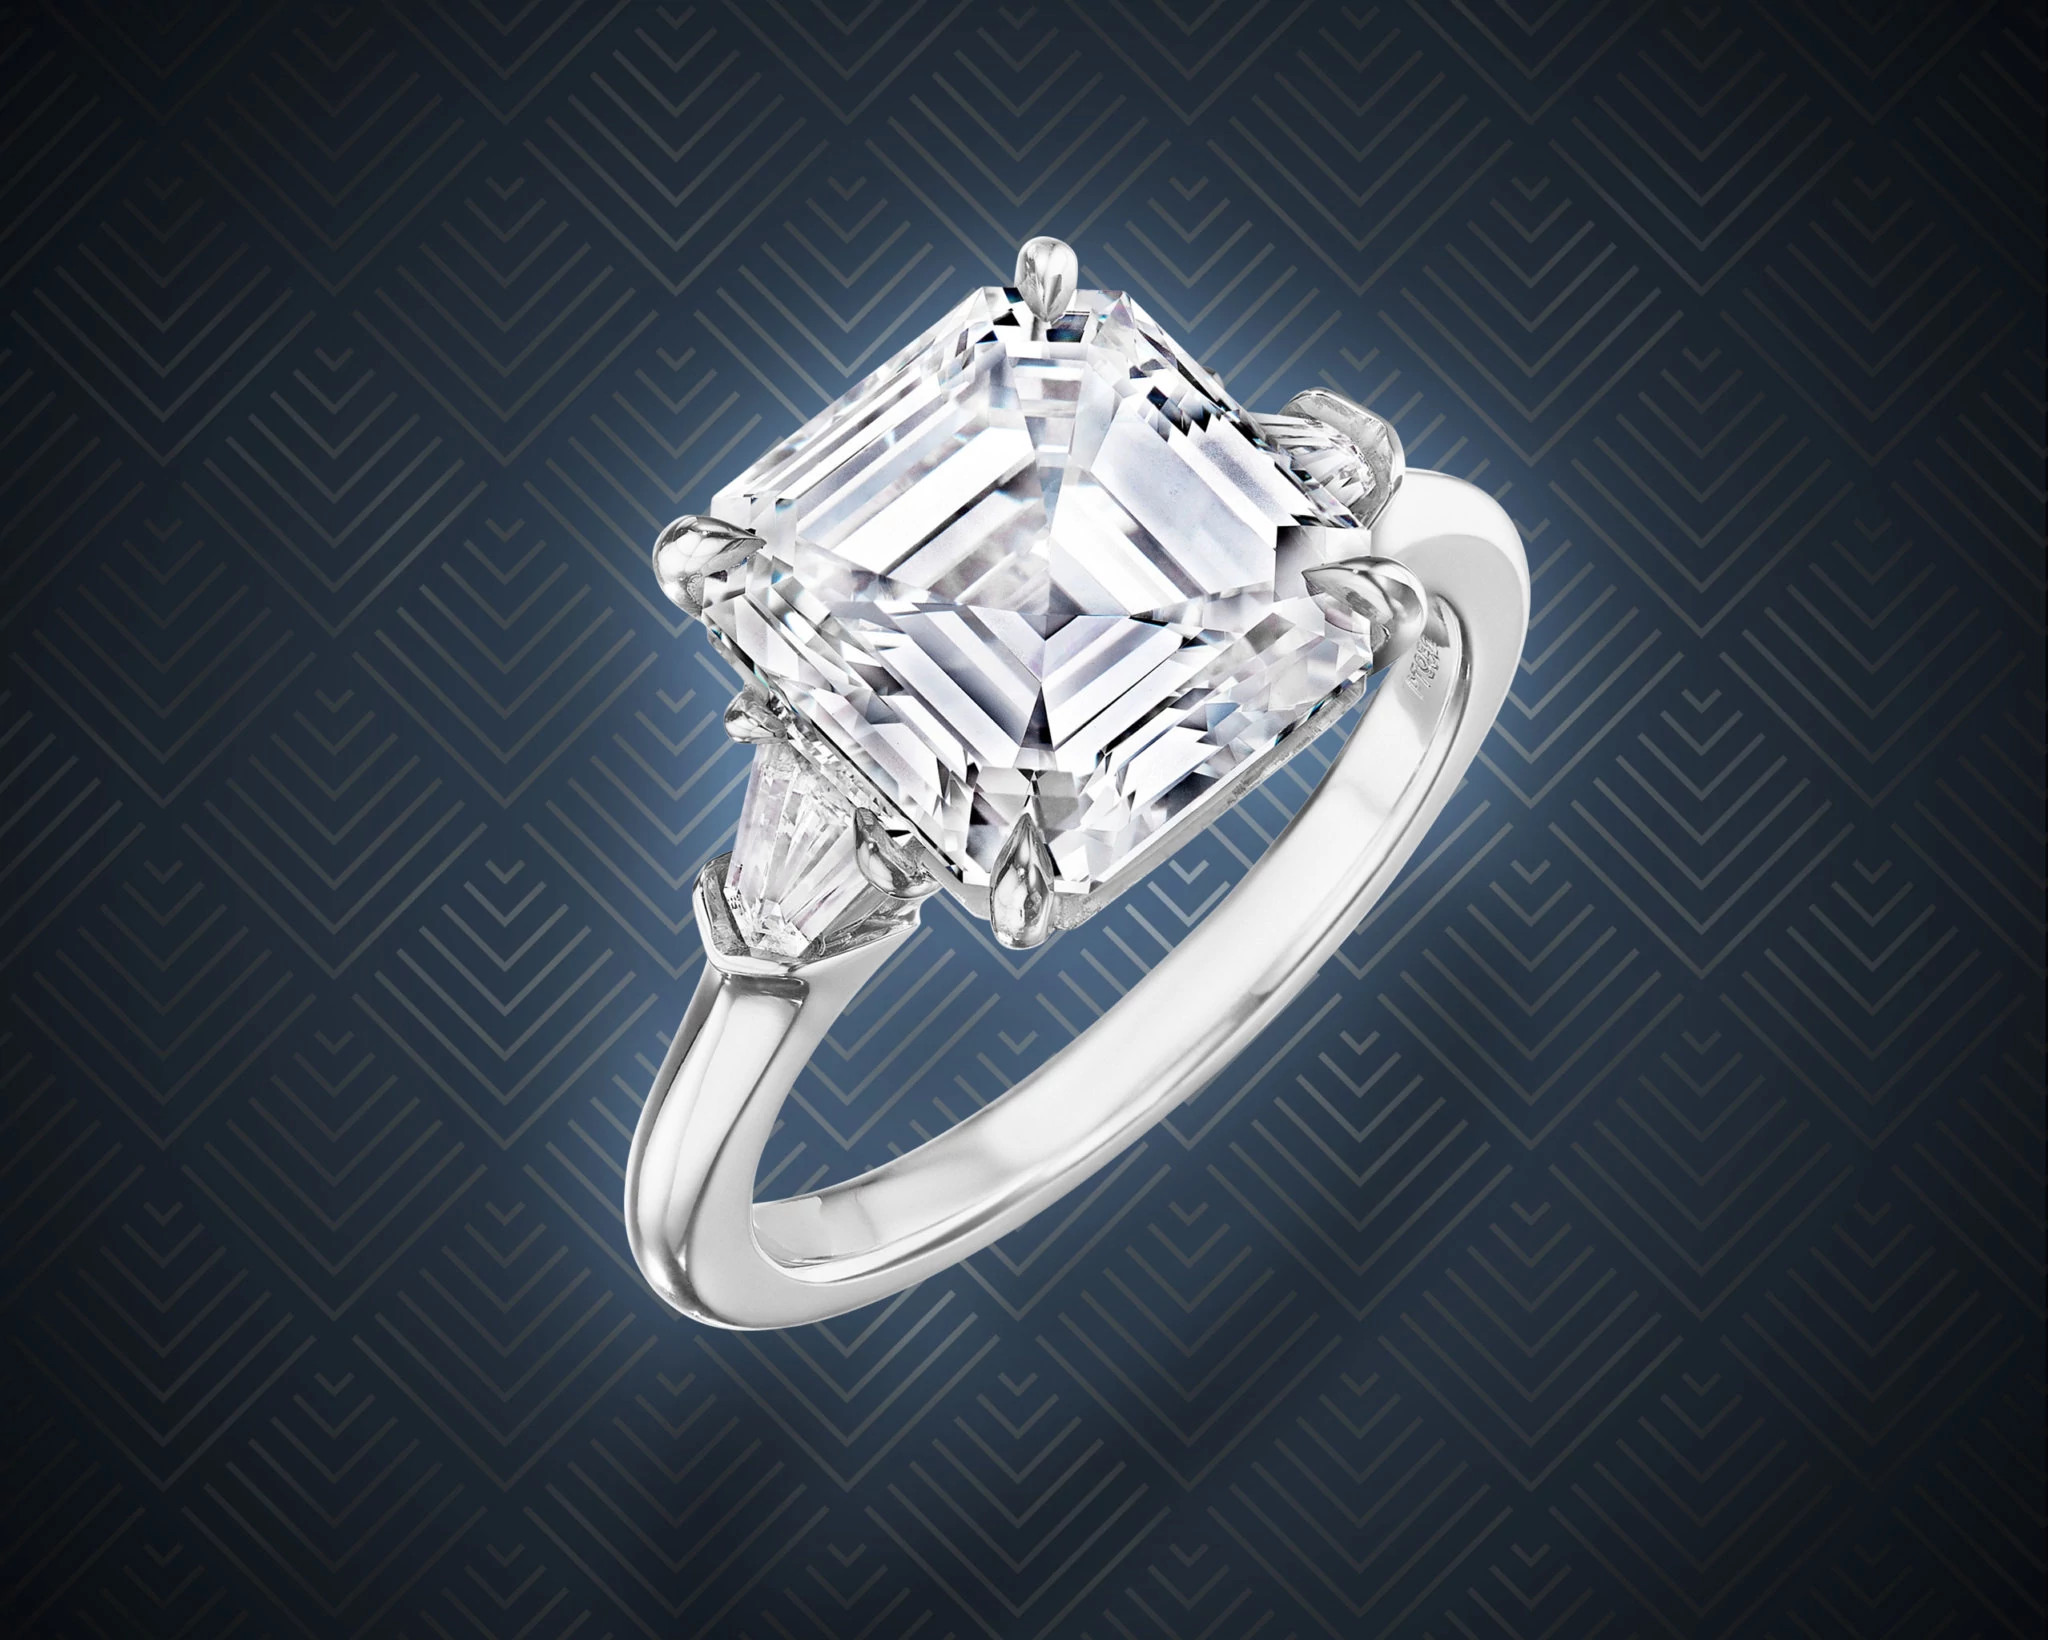 Lauren Addison天然钻石戒指